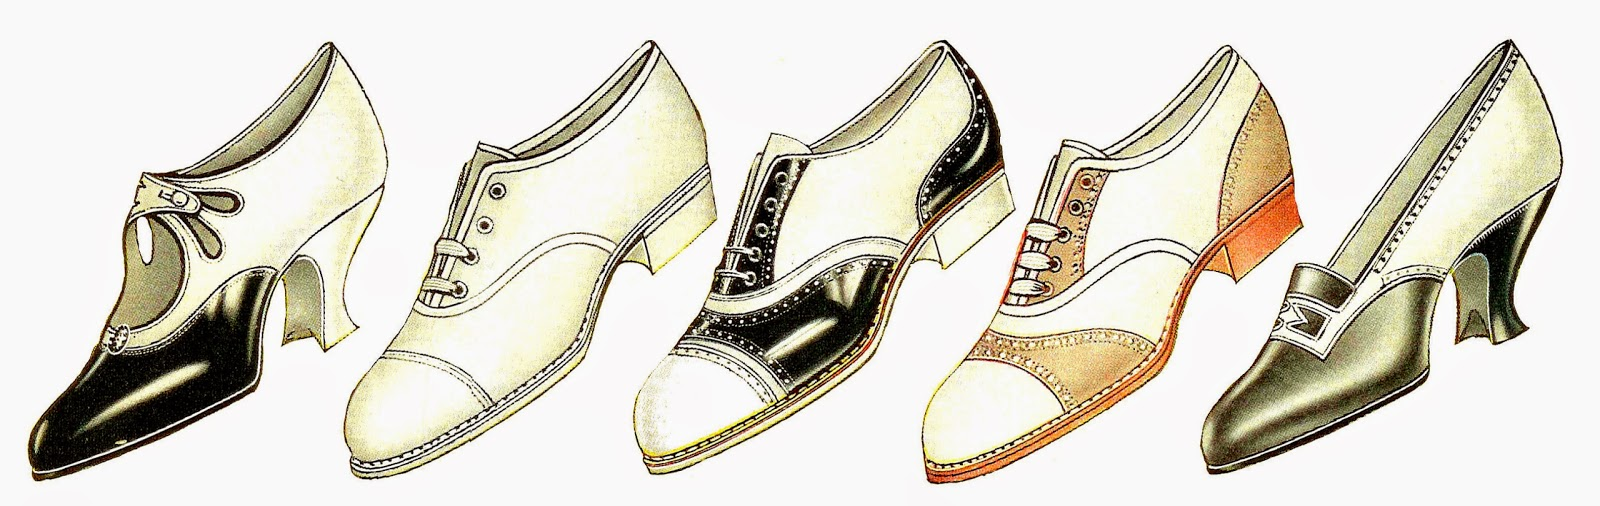 Perfect High Heel Clip Art Clipart Best Xomlvfk  Women Shoes  Women Shoes